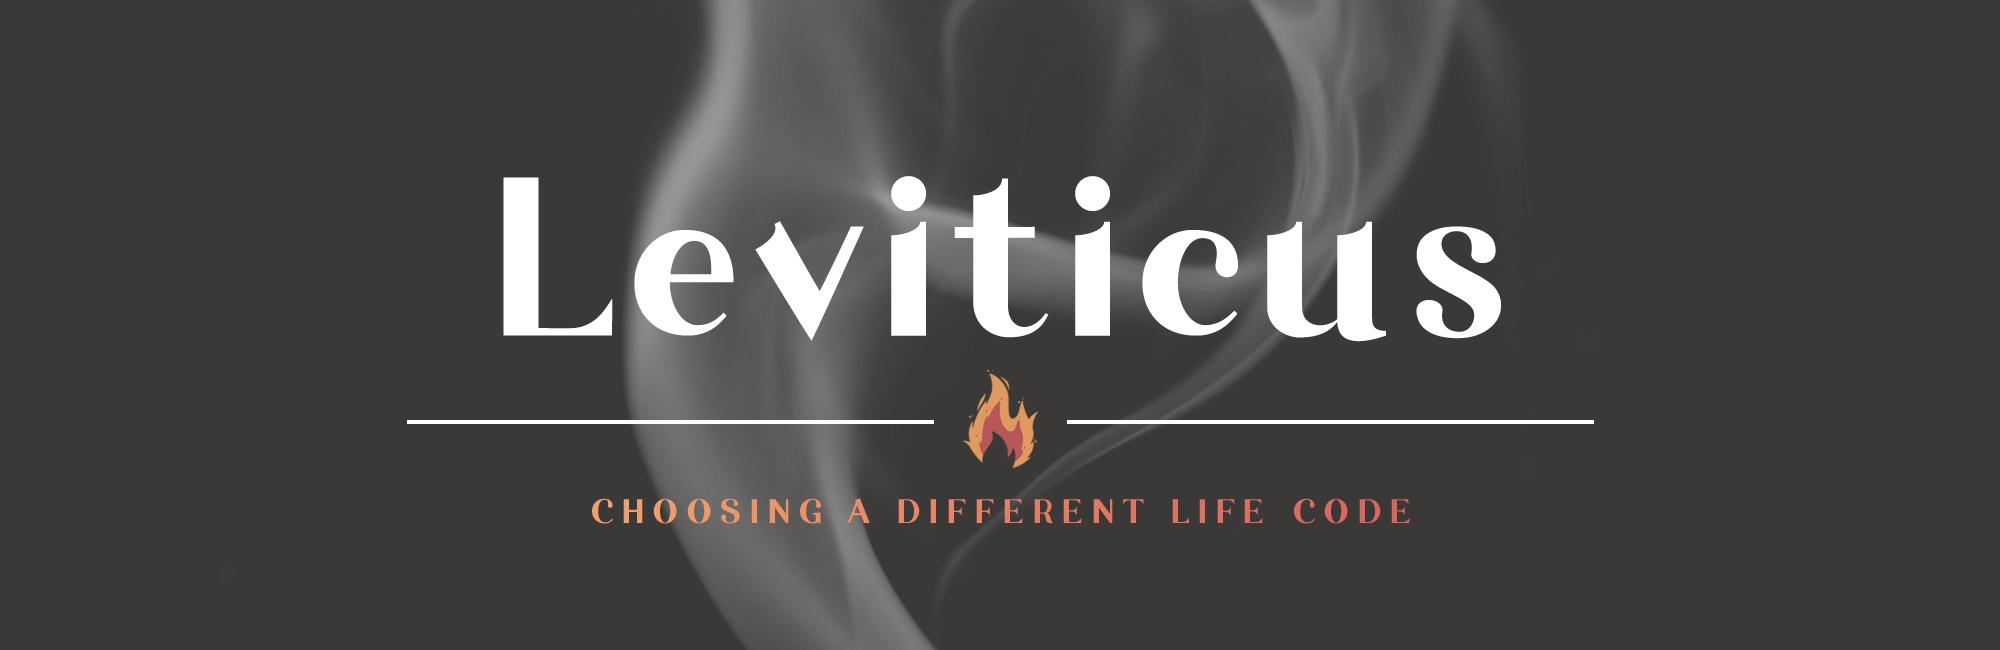 Leviticus - Web - Message Header